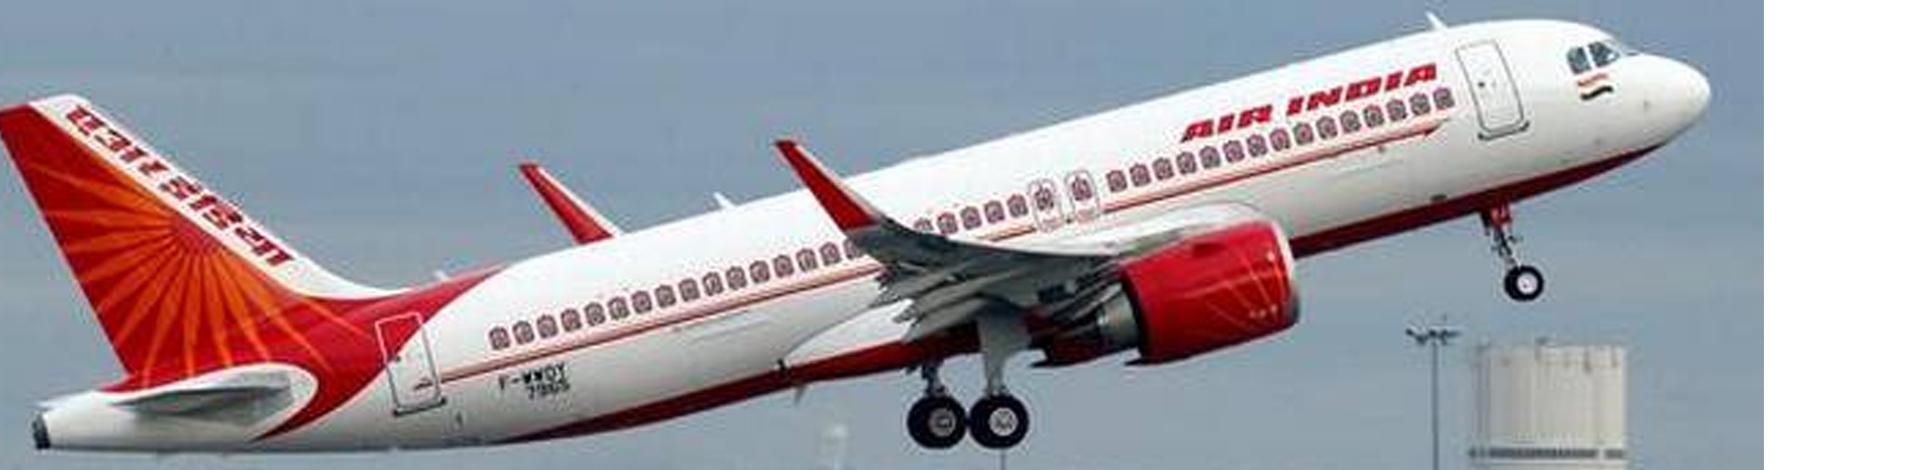 Air India 2